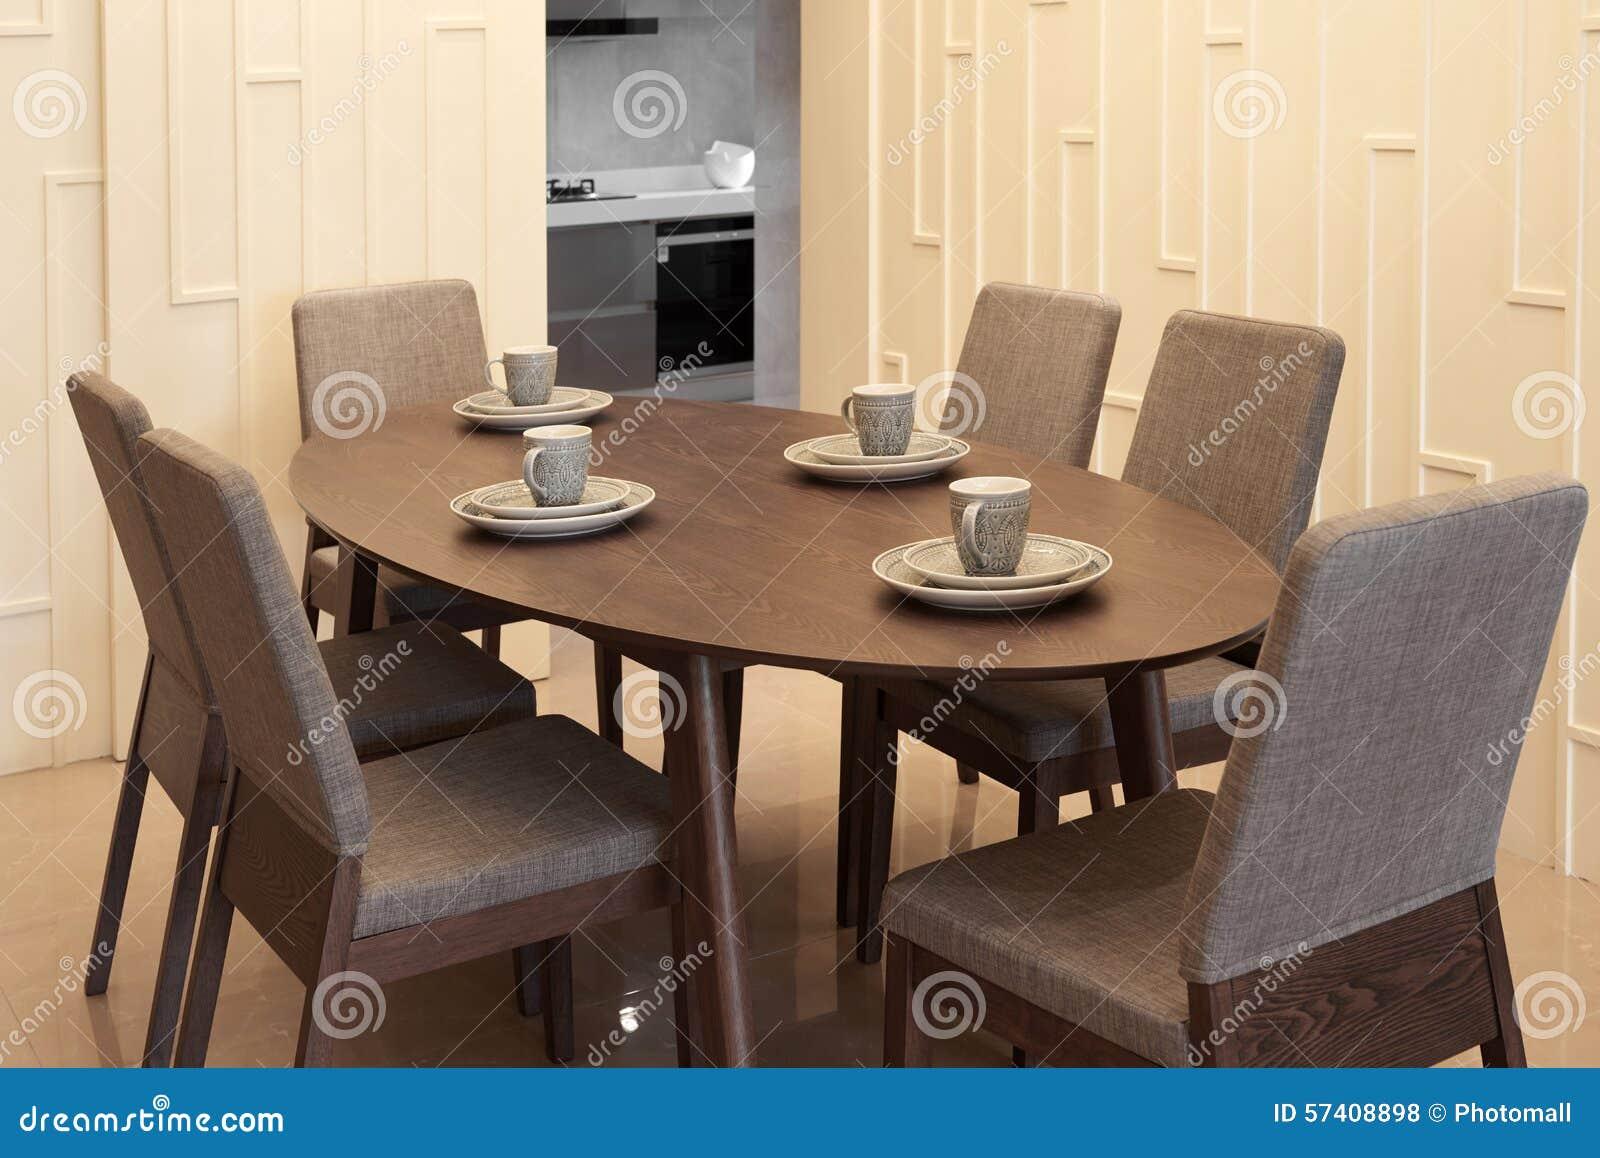 57408898 photo du à manger moderne stockImage Salle chinois FKJuTl1c35